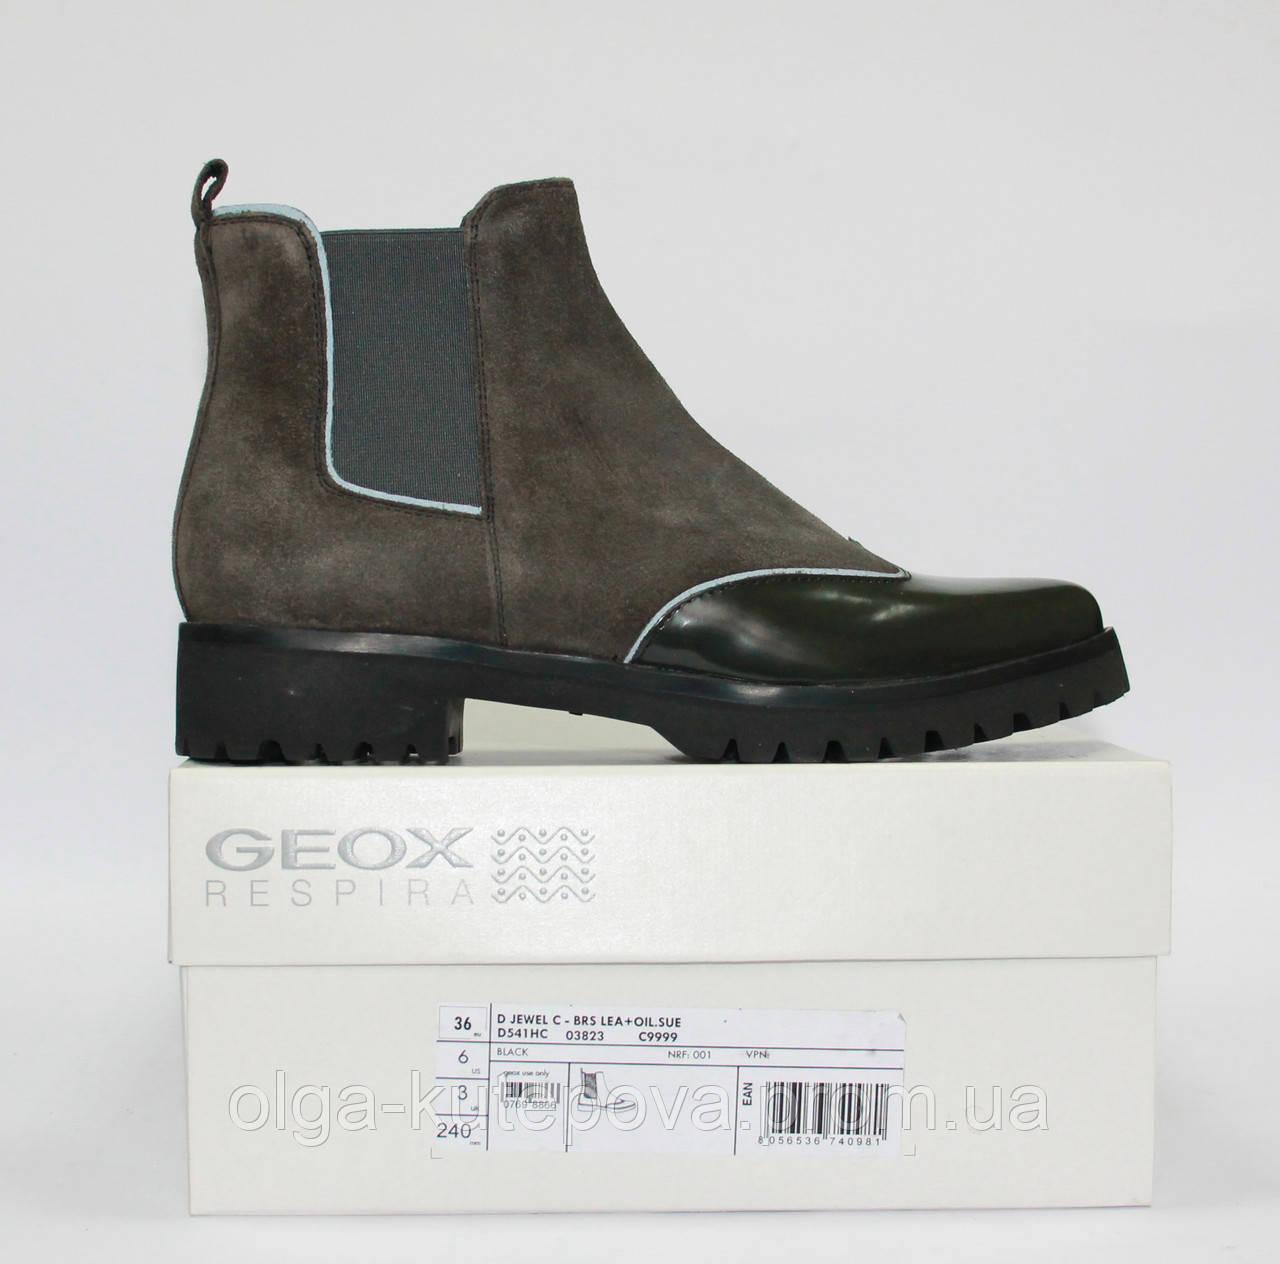 731468671 Ботинки челси GEOX Respira D Jewel C оригинал натуральная кожа 36 ...